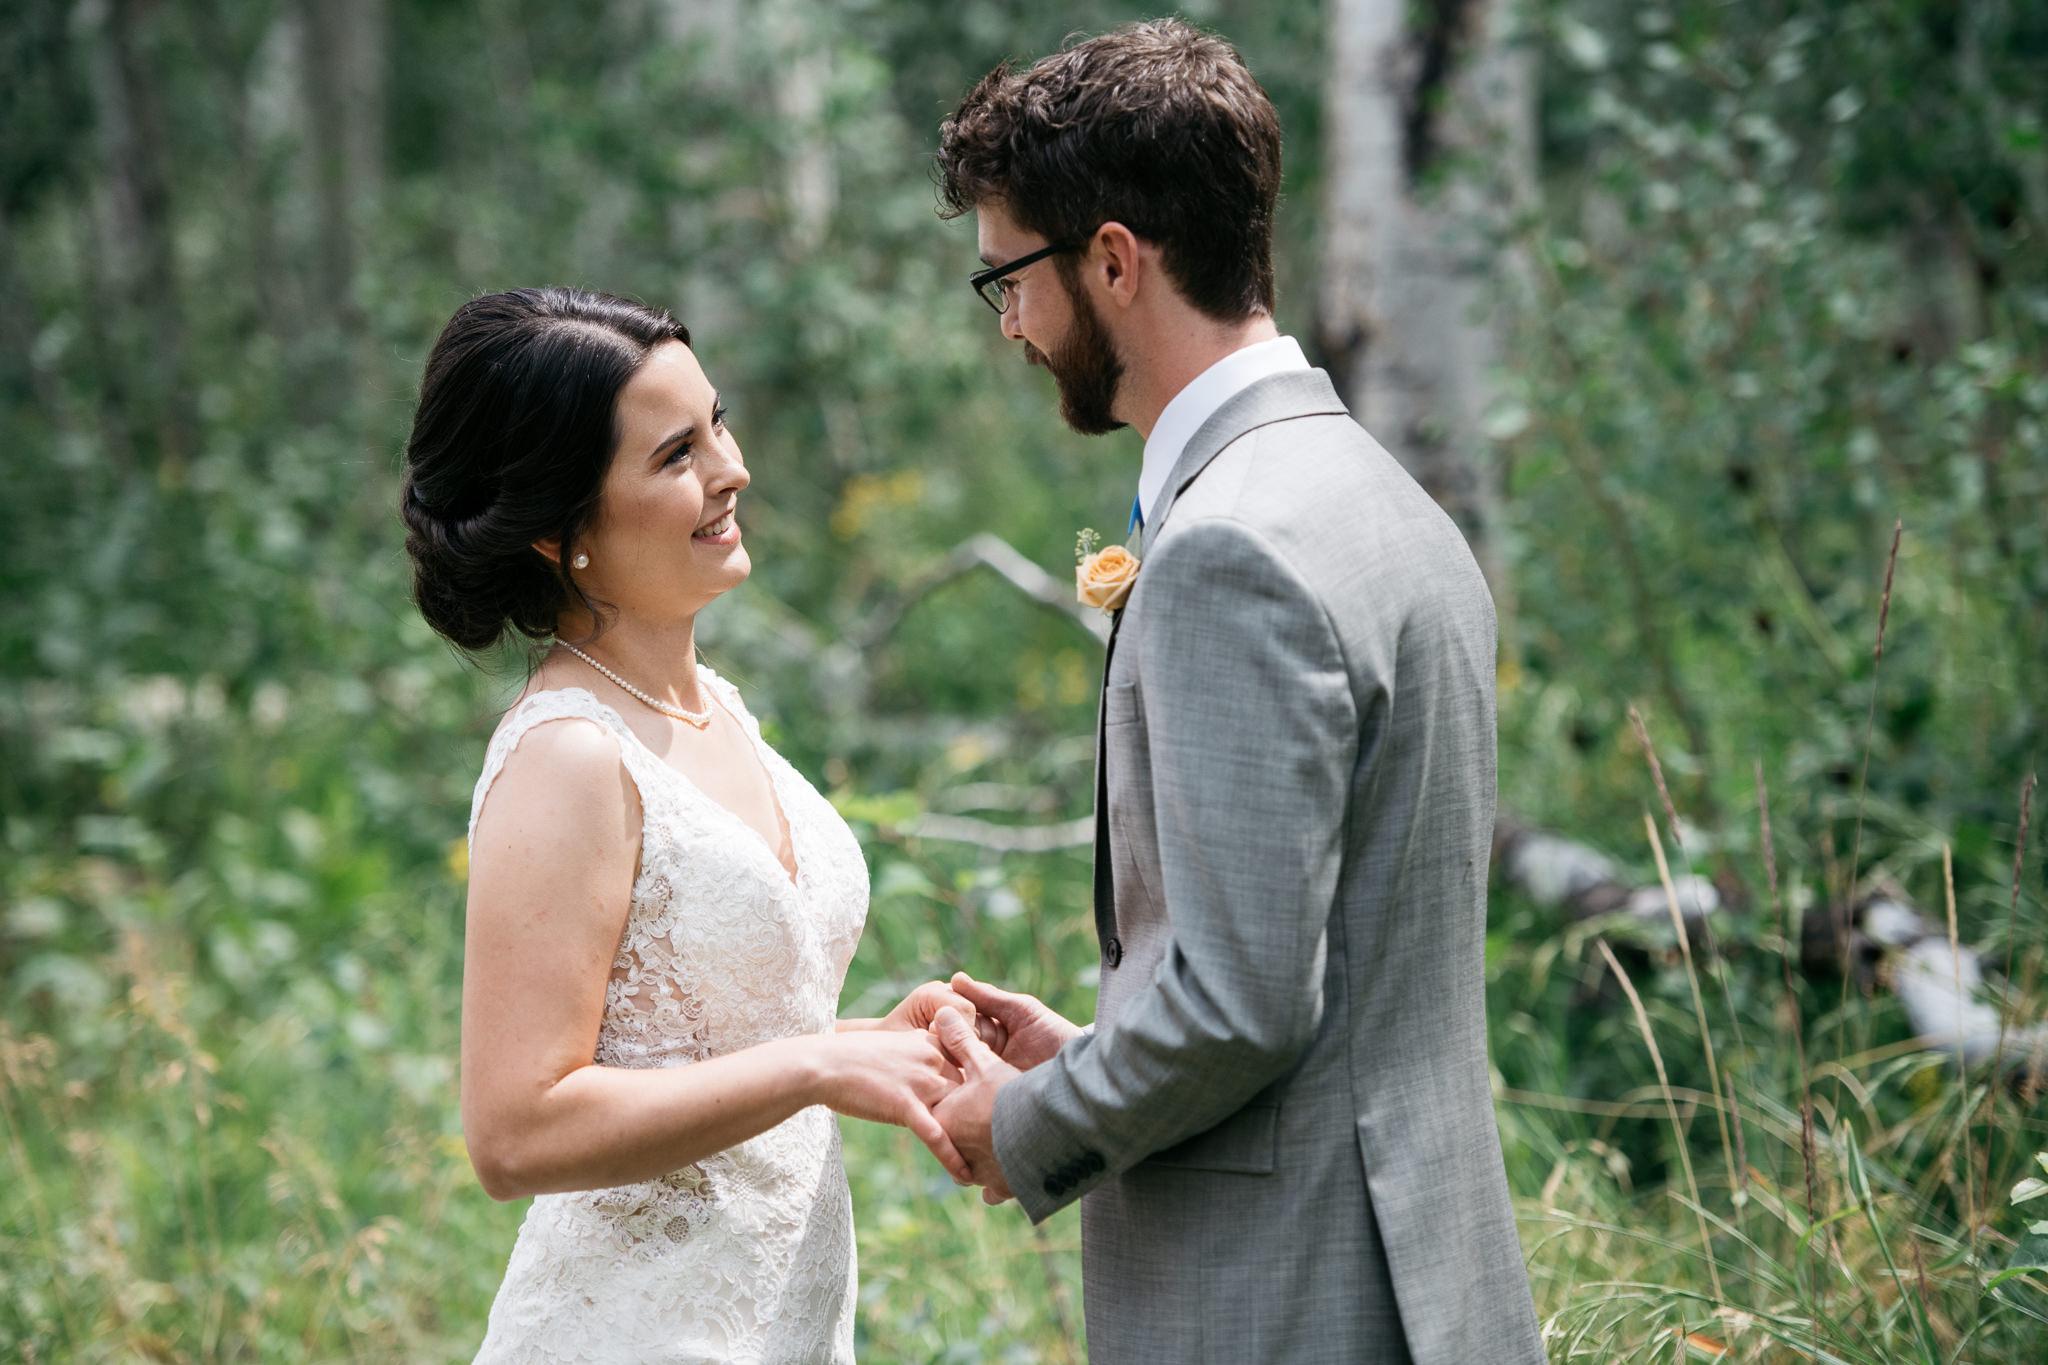 096_ONL_Kat_Nick_Wedding_Trevor_Hooper_Photo.jpg